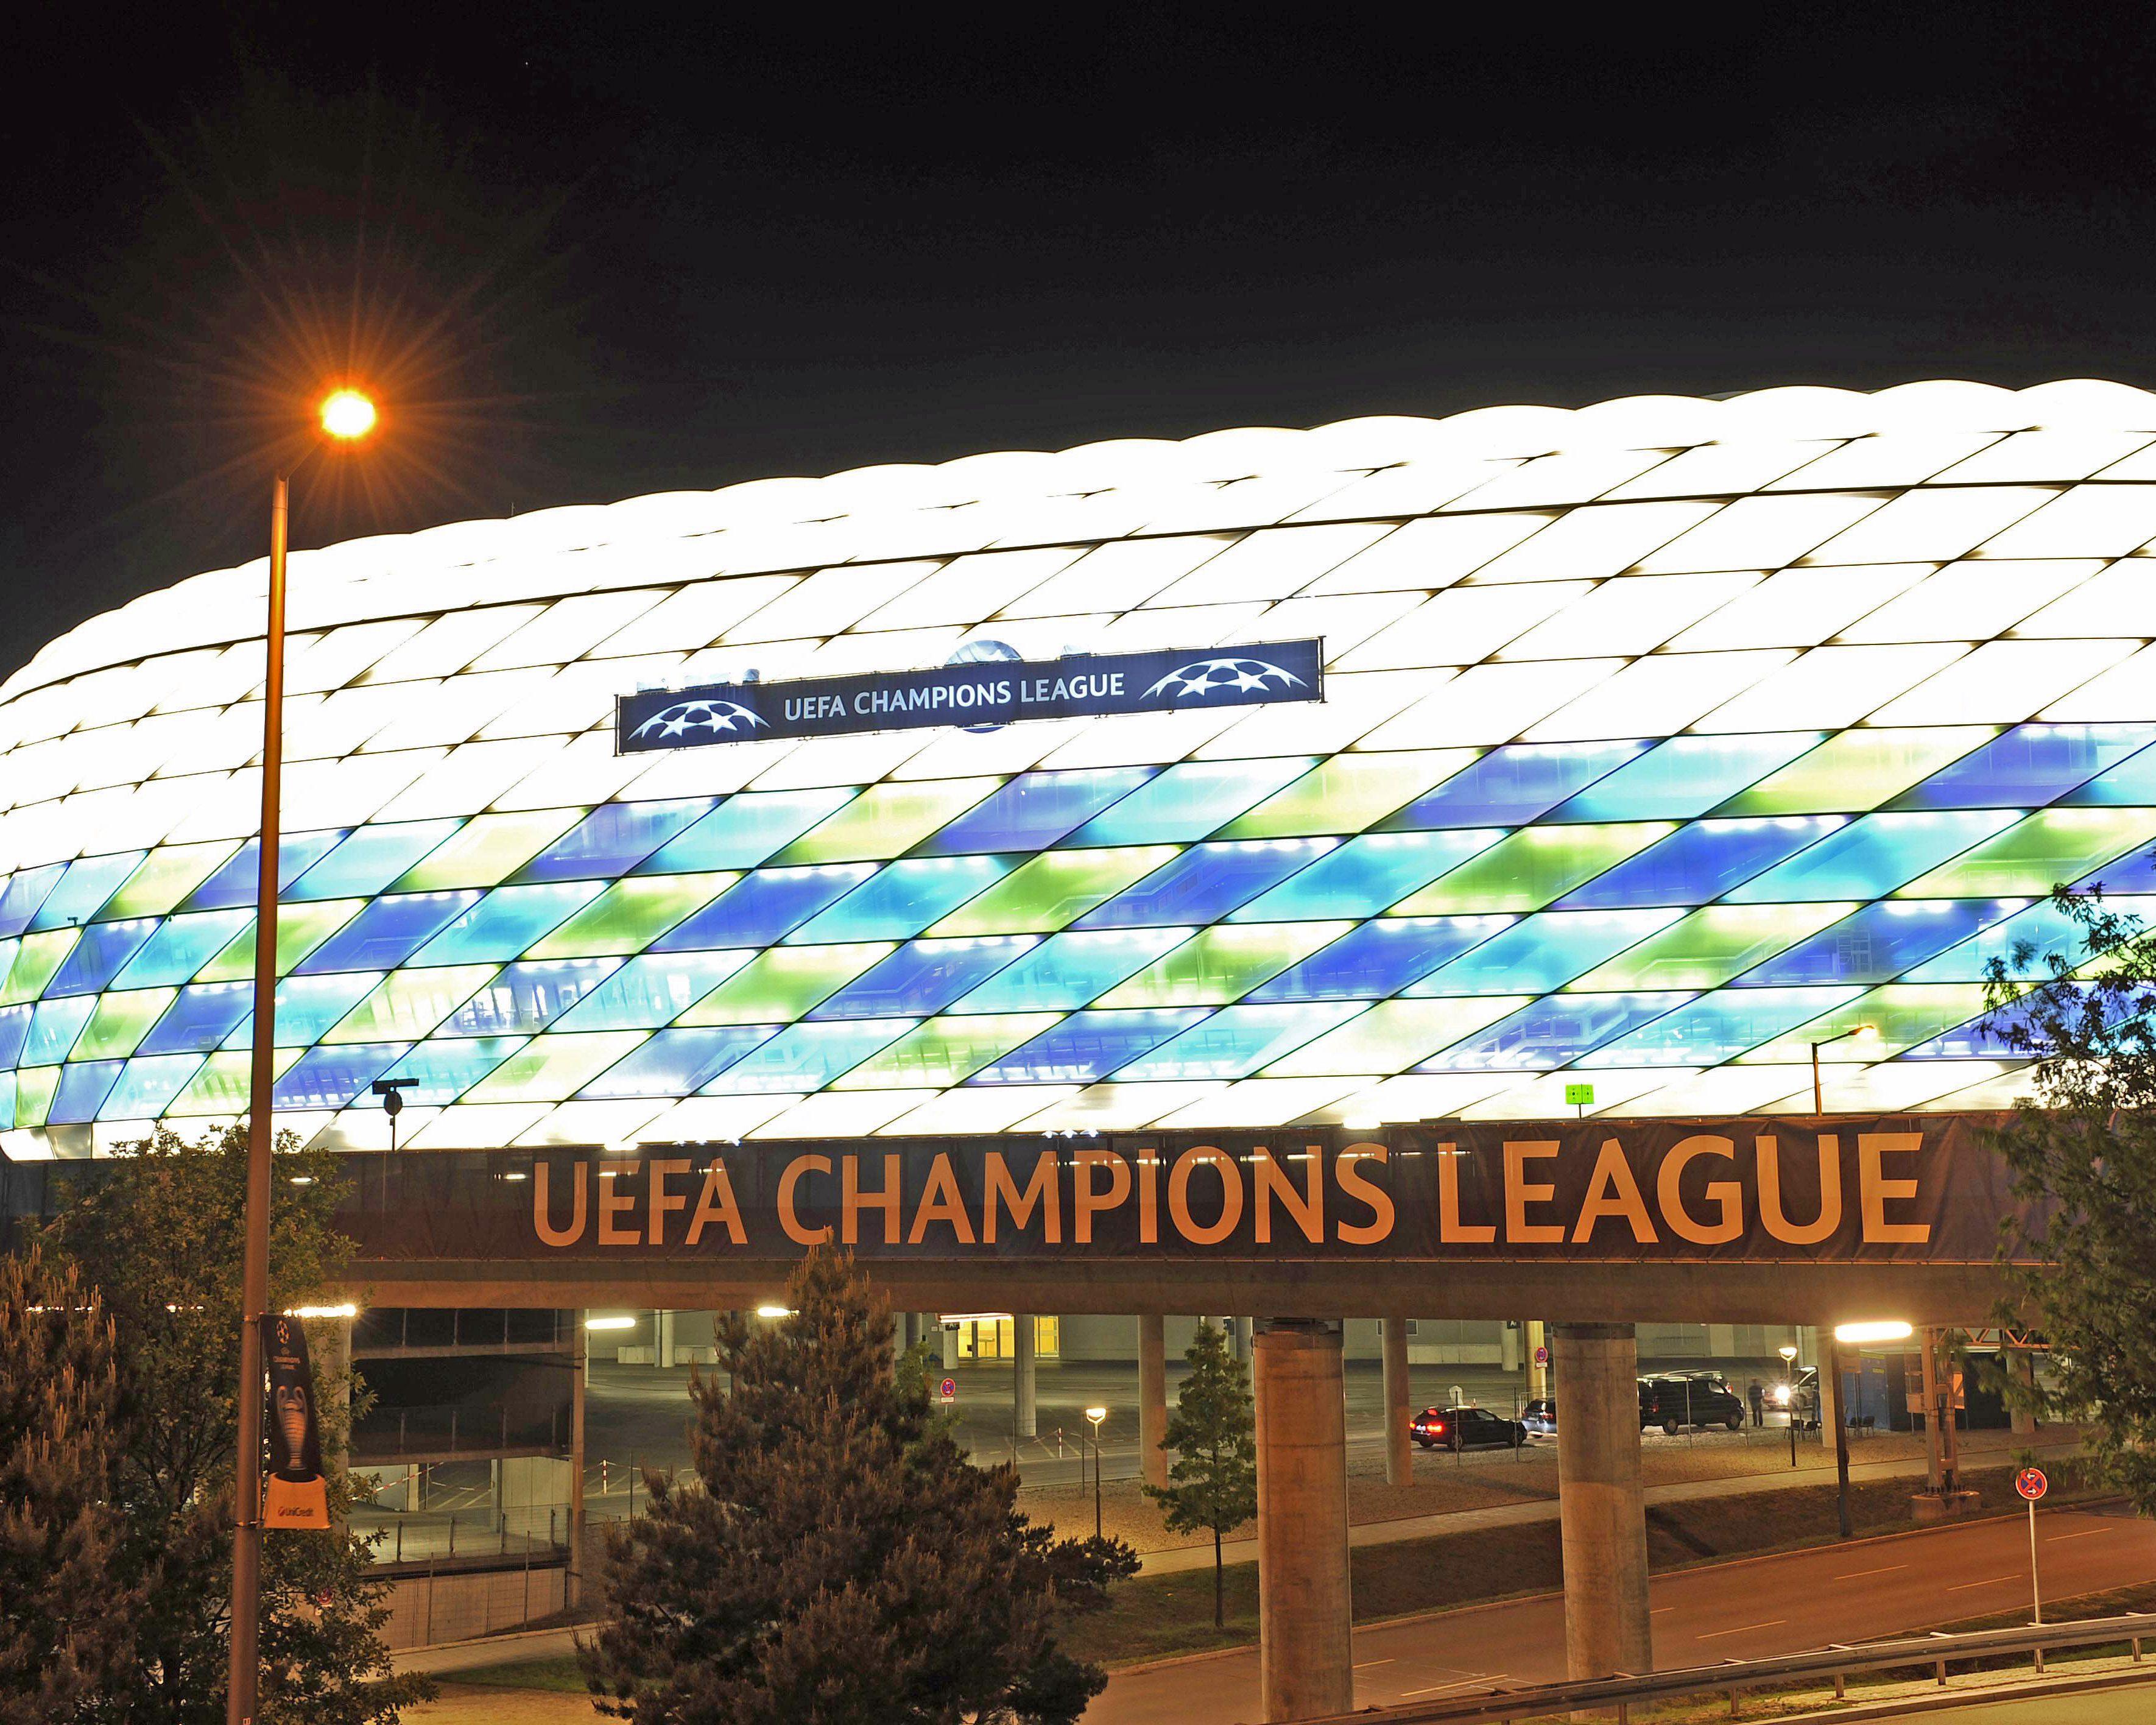 bundesliga bayern munich s allianz arena may host 2021 champions league final bundesliga bayern munich s allianz arena may host 2021 champions league final